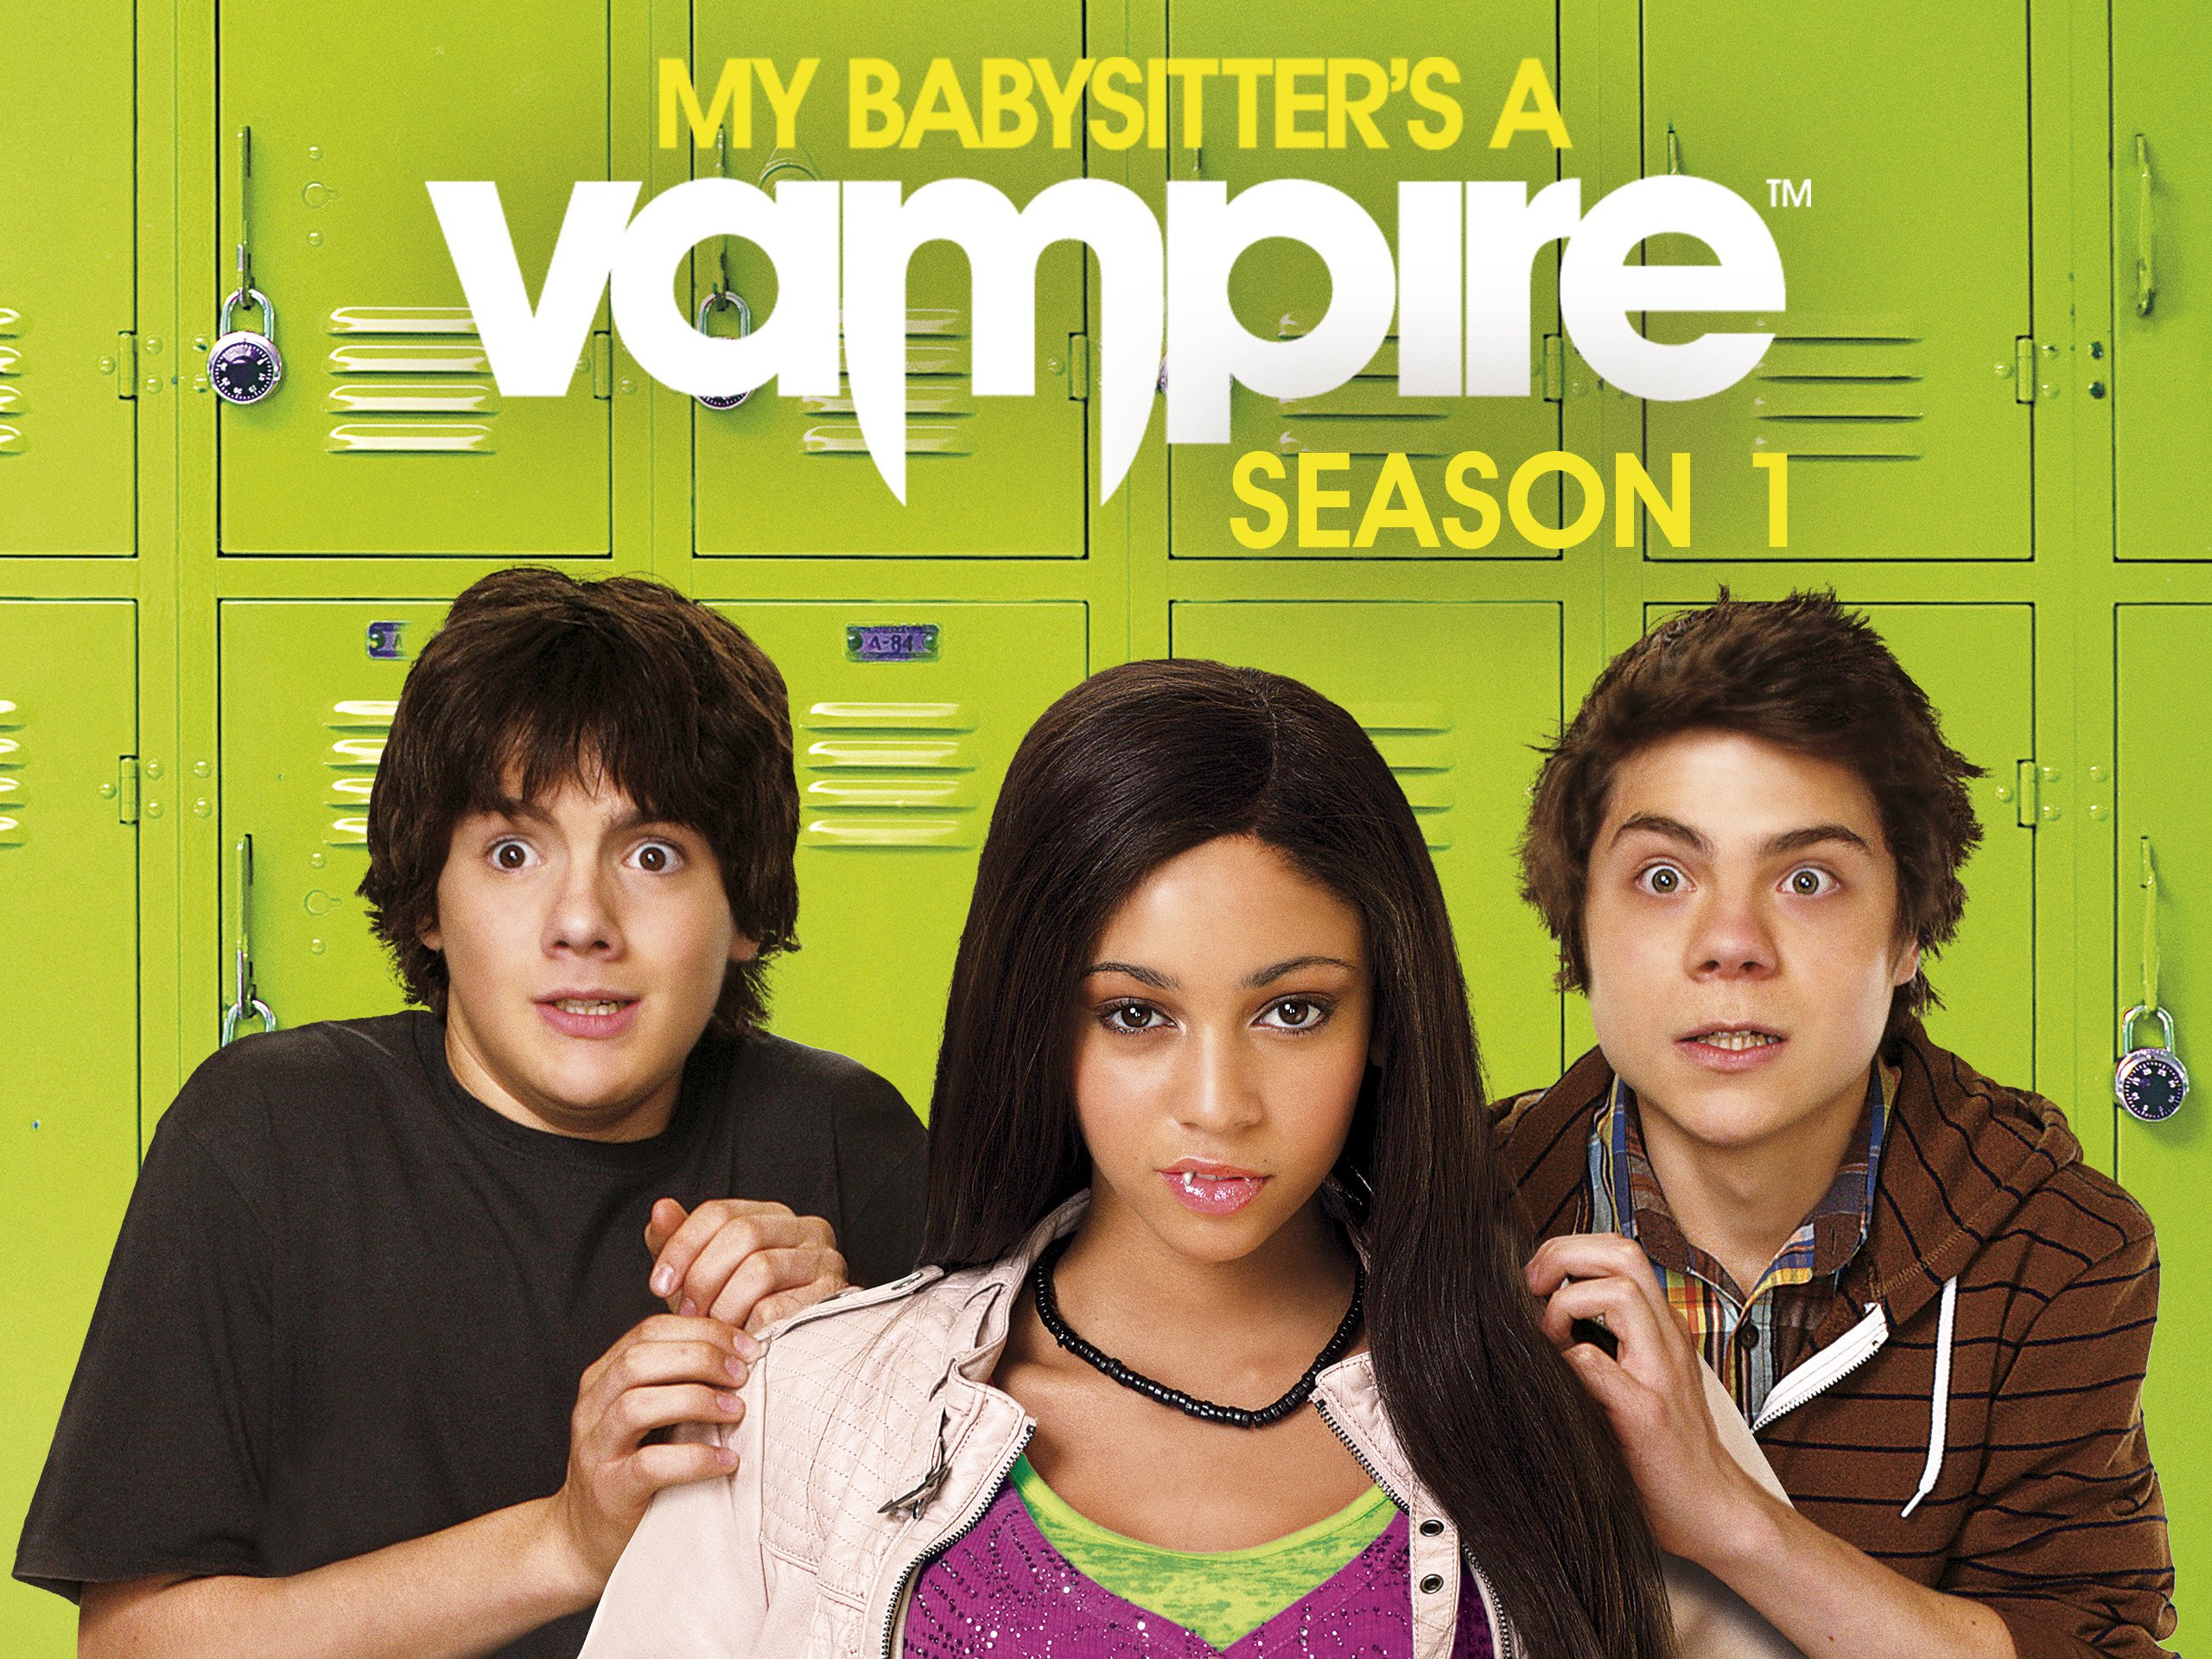 my babysitters a vampire season 1 episode 8 full episode